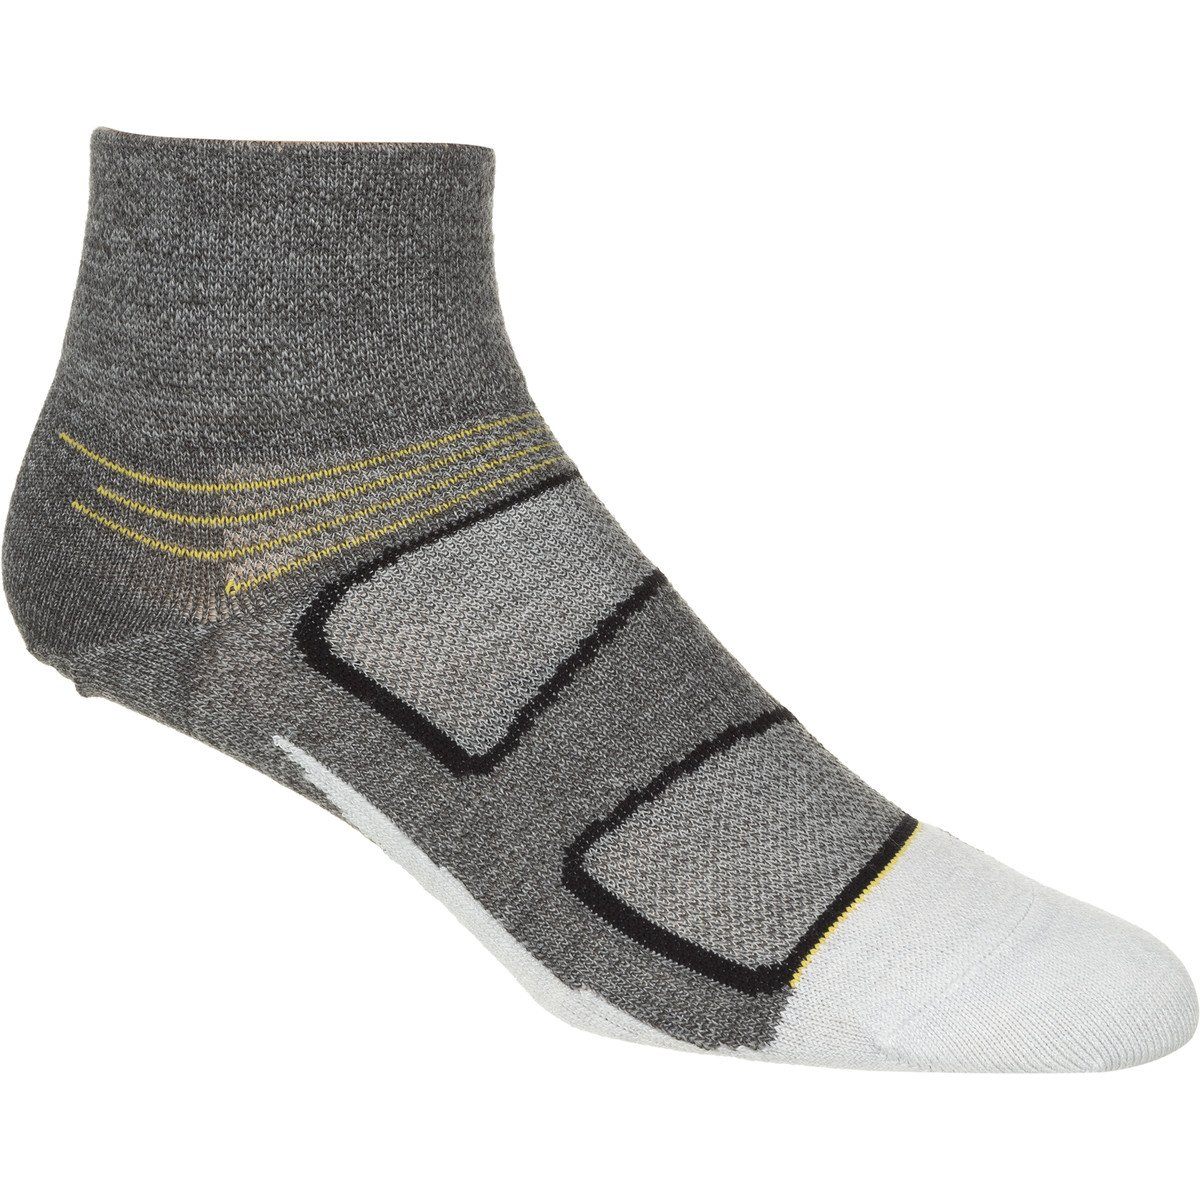 Elite Merino Gray//Yellow Medium Feetures Ultra-Light Cushion Quarter Socks